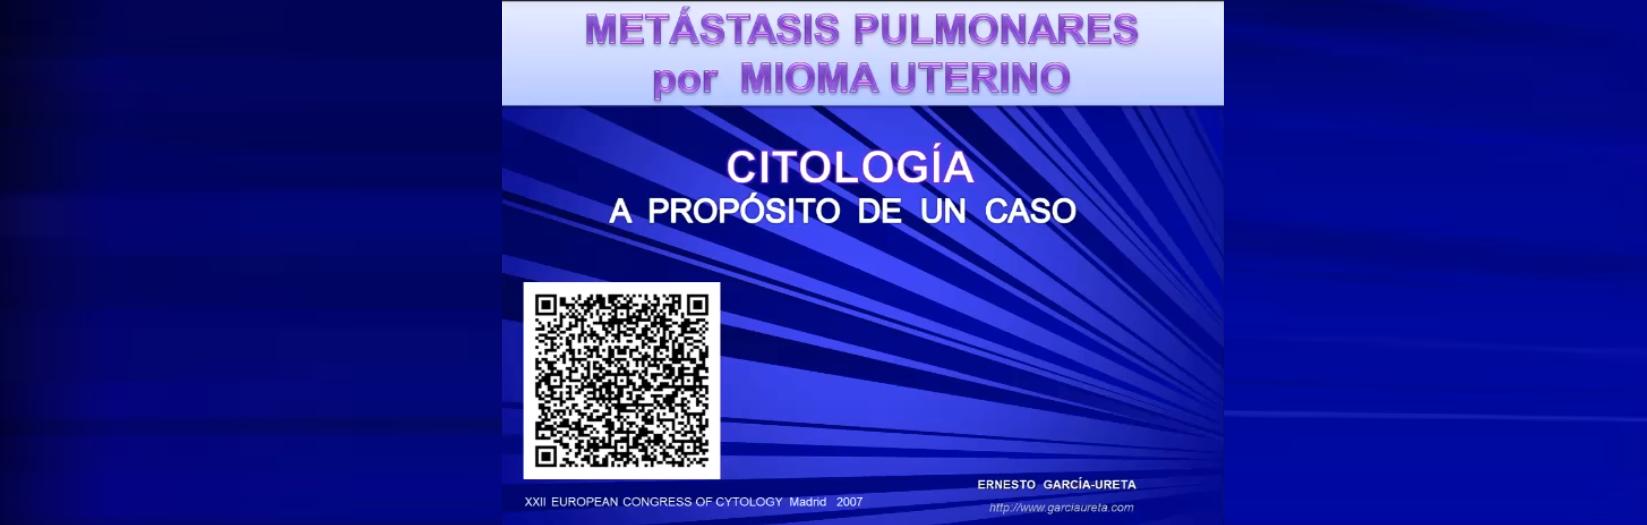 Metastasis en pulmón